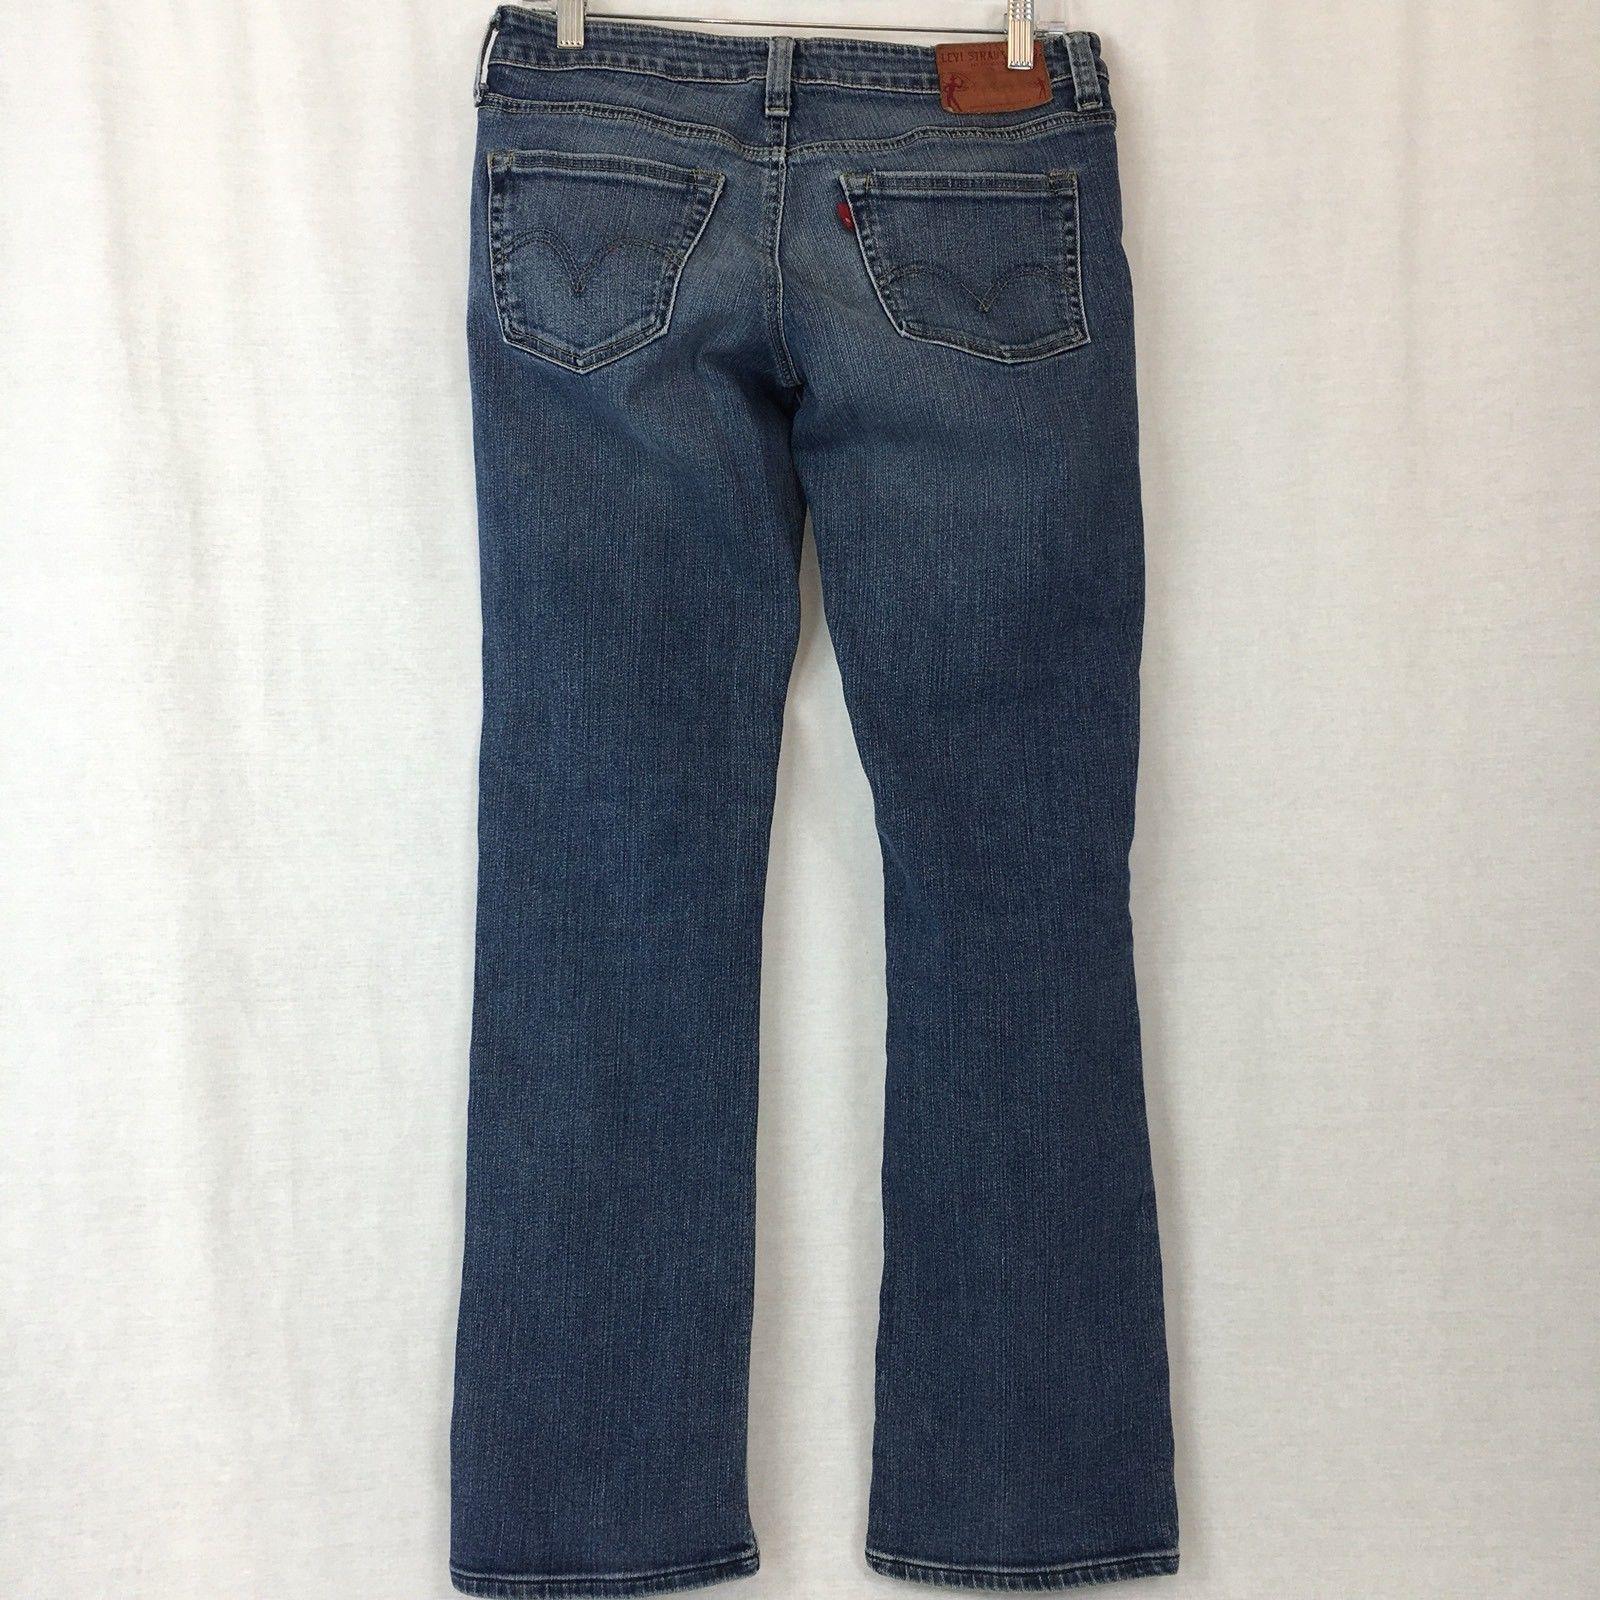 Levi's Demi Straight Jeans Cotton Stretch Low Rise Button Fly VTG USA Size 29M